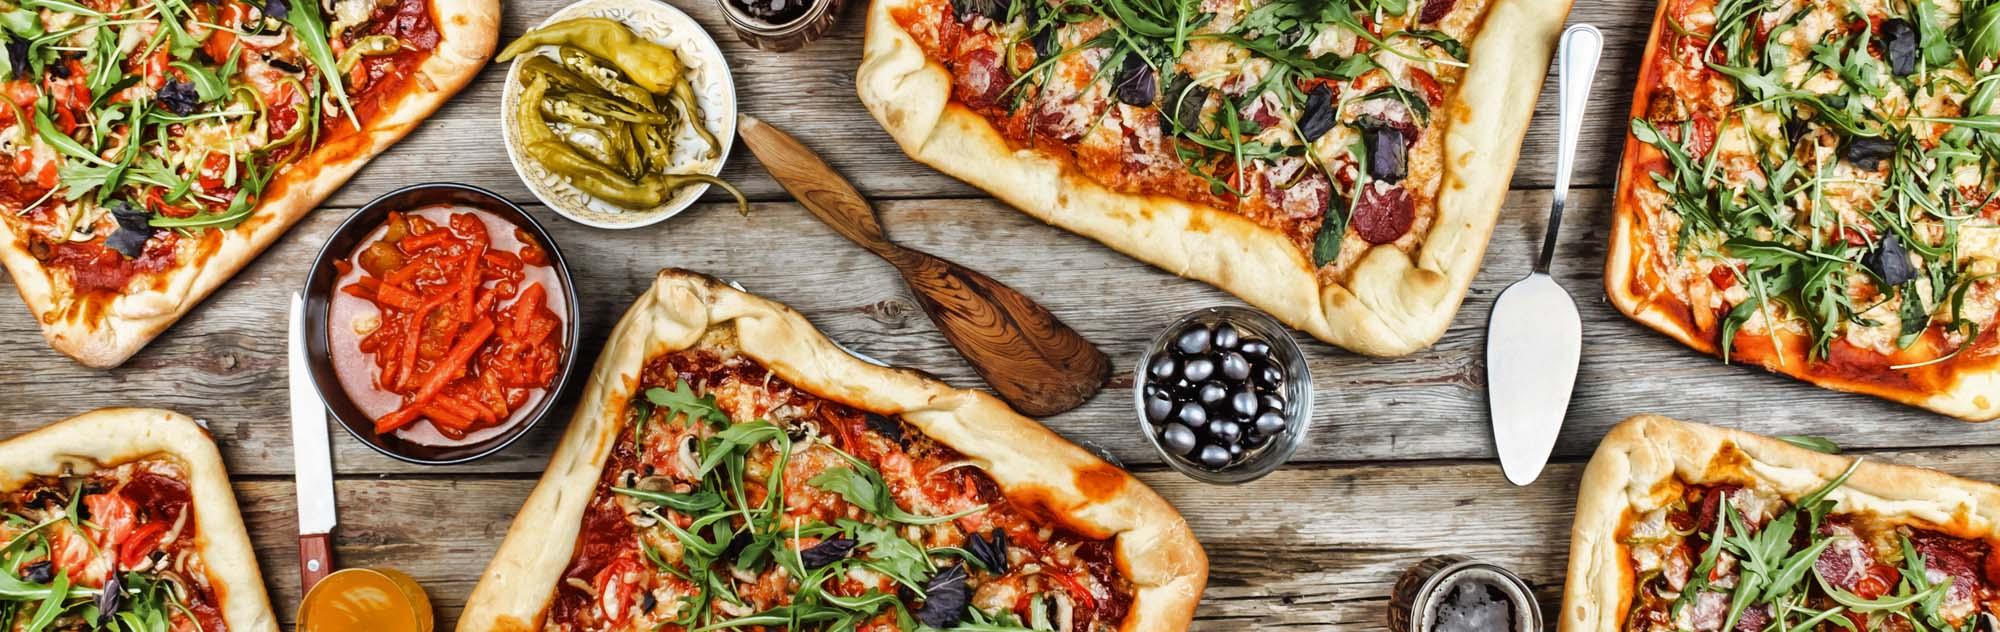 Bradepande pizza